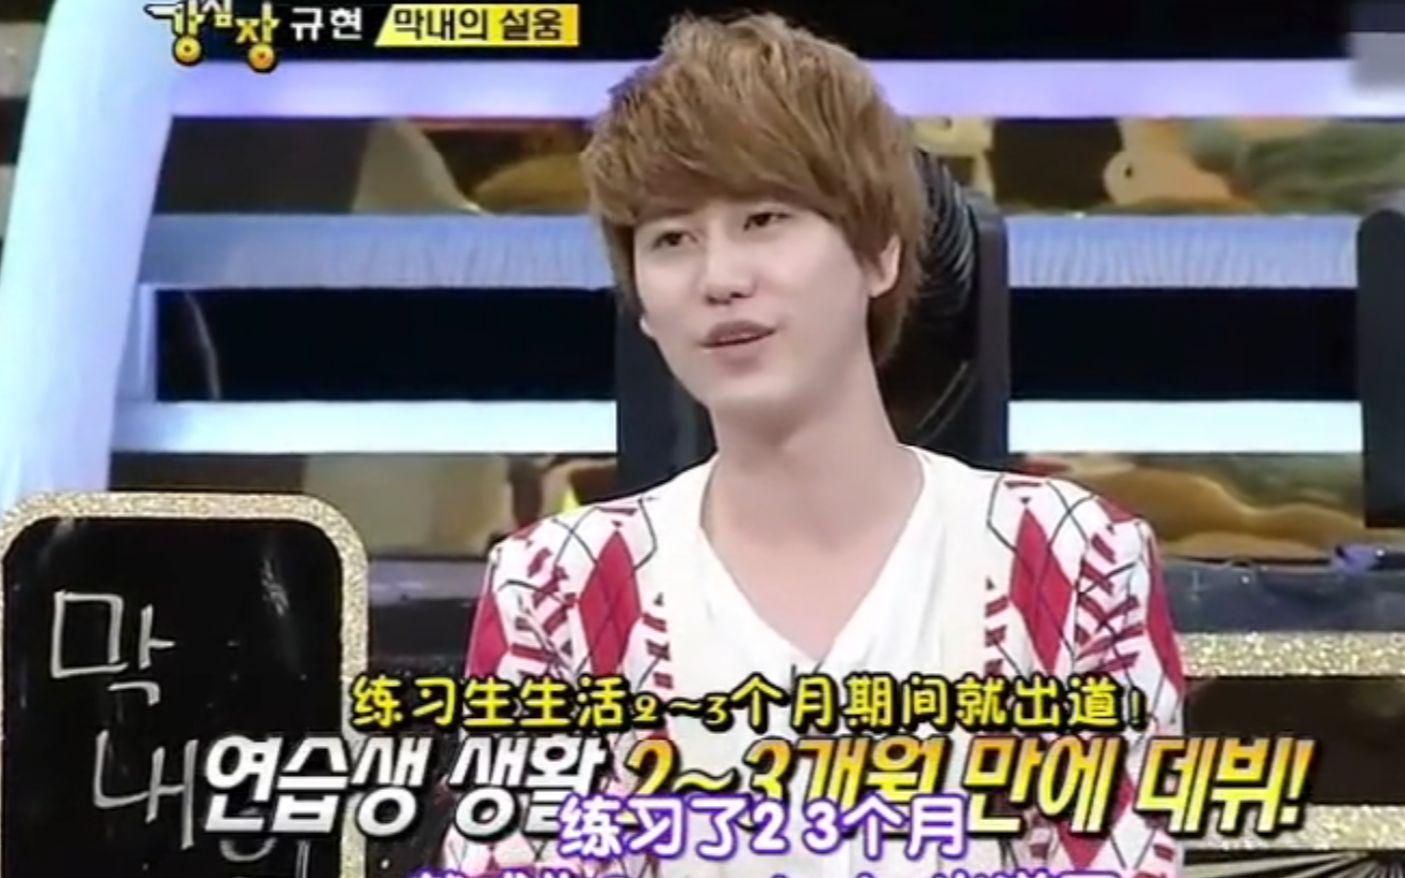 【Super Junior綜藝】SUJU團霸曺圭賢,強心臟大吐苦水,曾經被哥哥們使勁欺負!_嗶哩嗶哩 (゜-゜)つロ 干杯~-bilibili